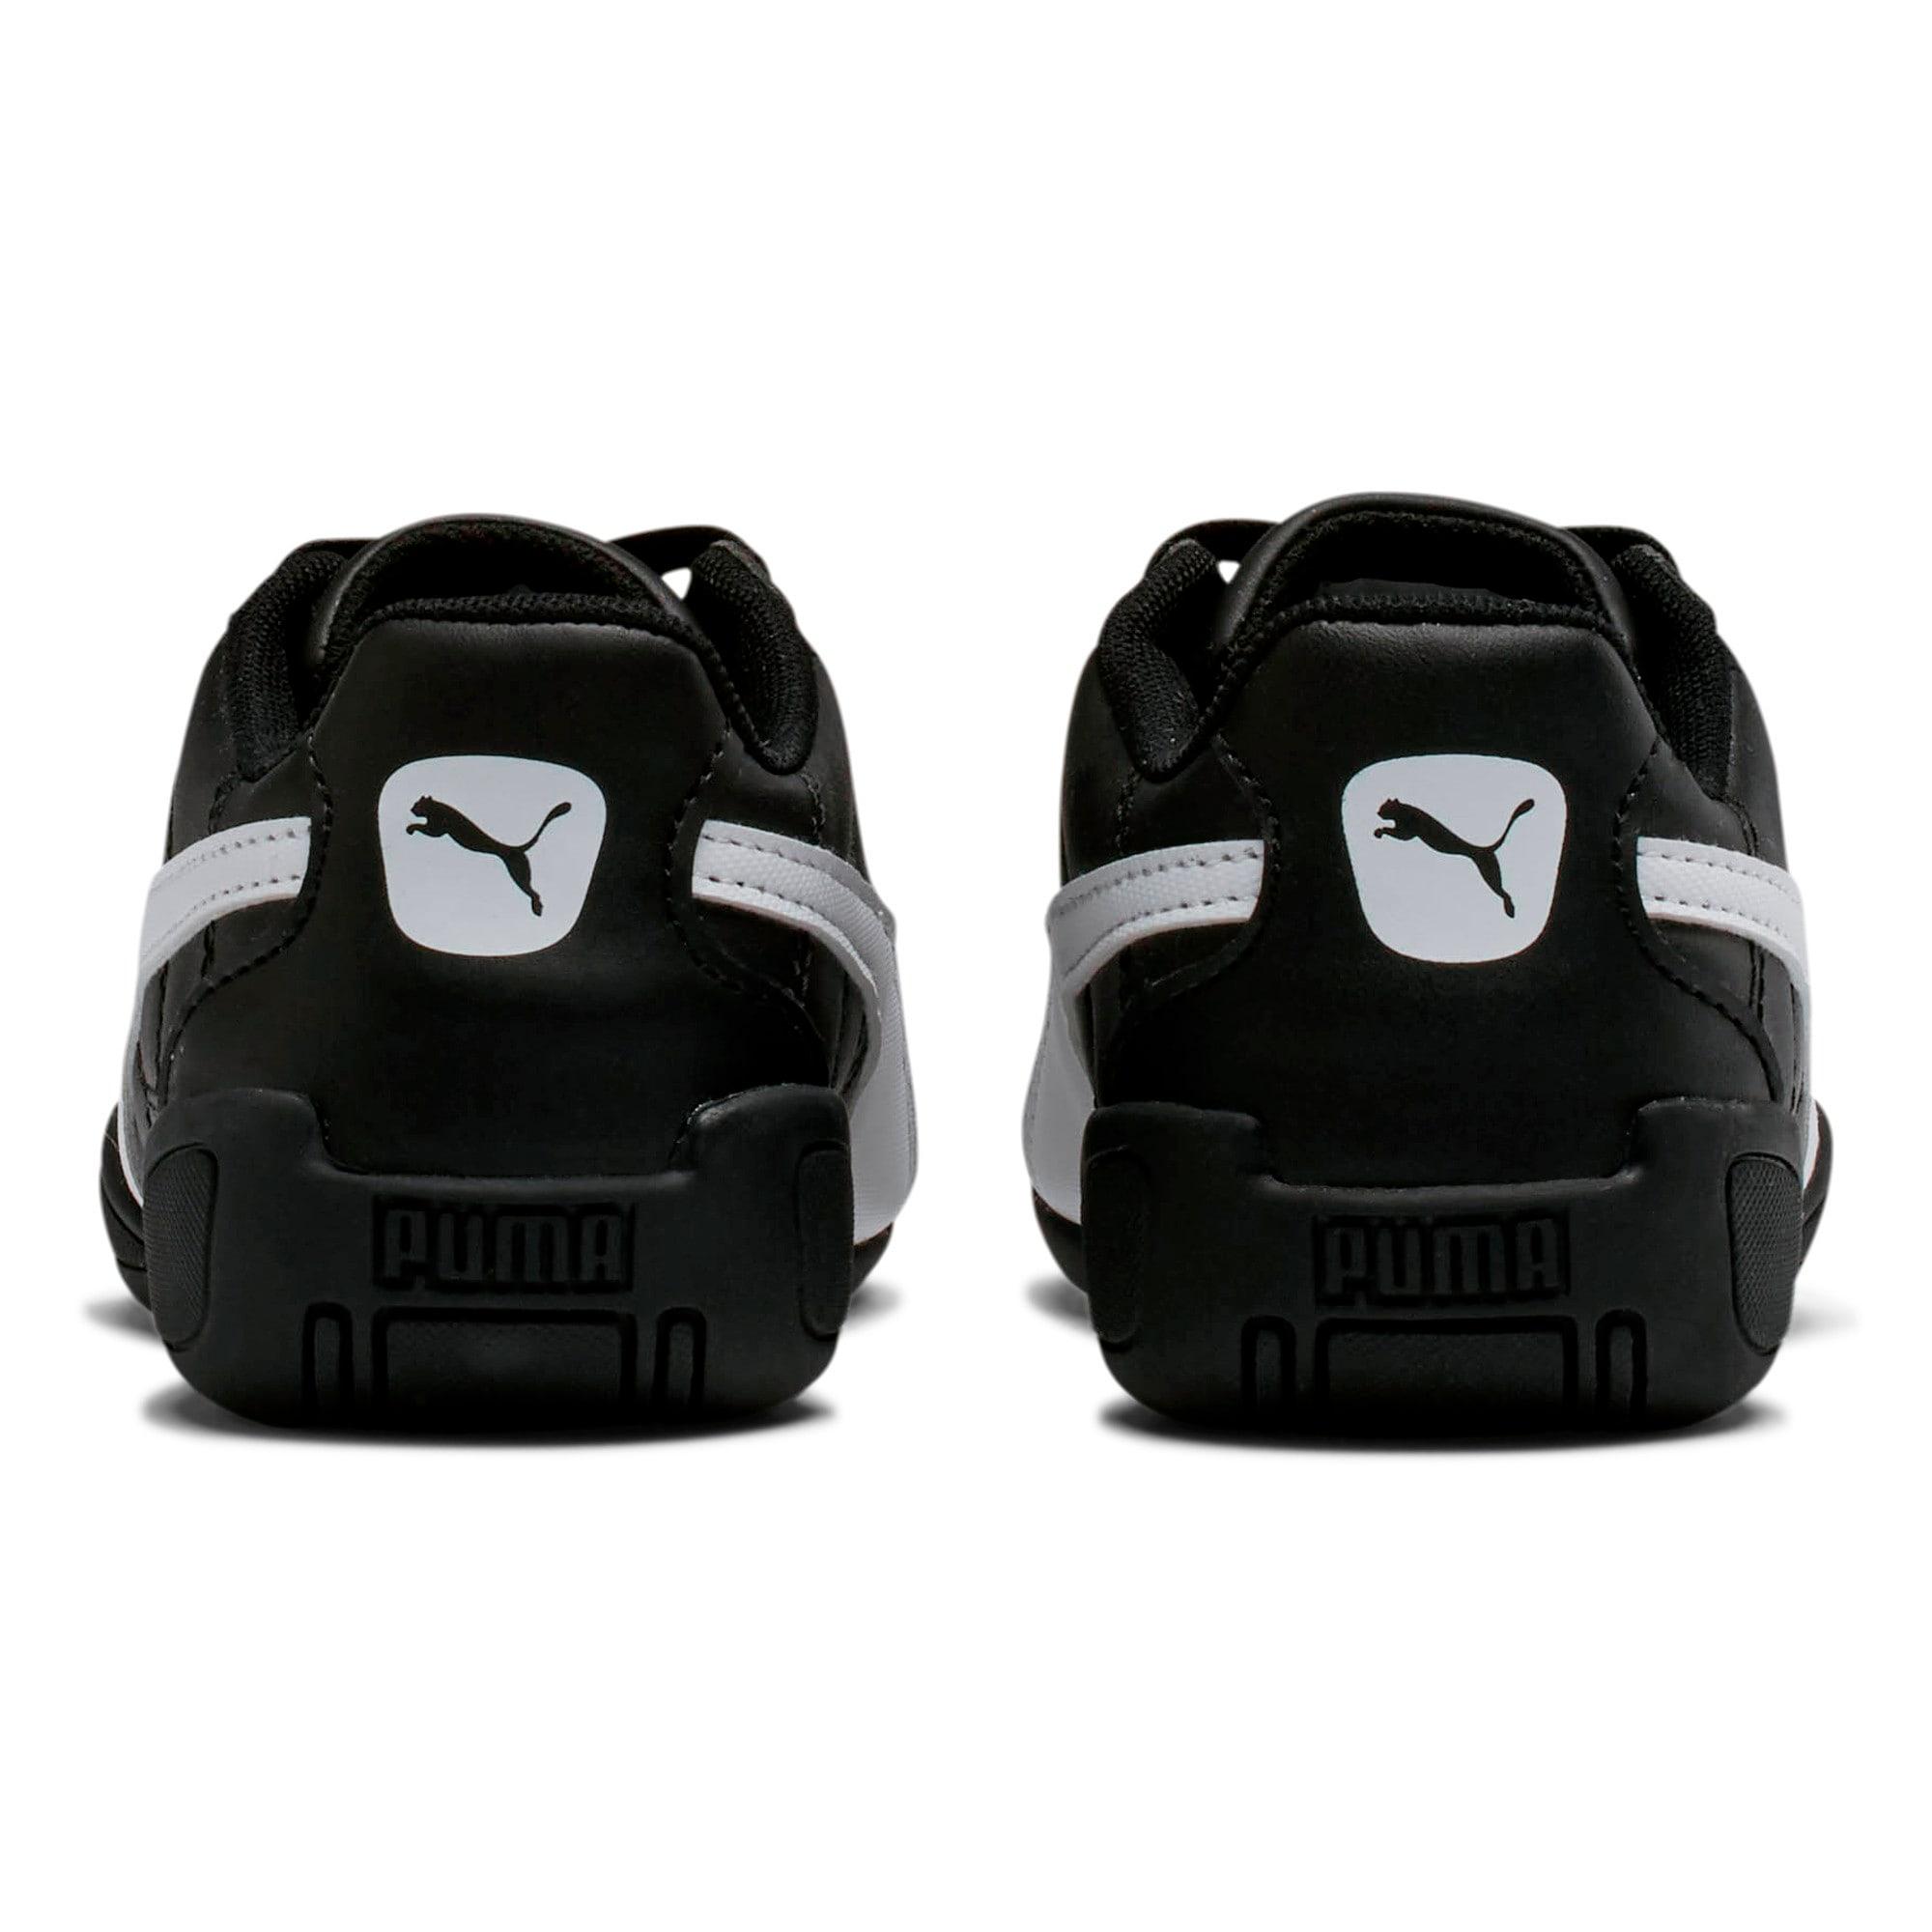 Thumbnail 4 of Tune Cat 3 Little Kids' Shoes, Puma Black-Puma White, medium